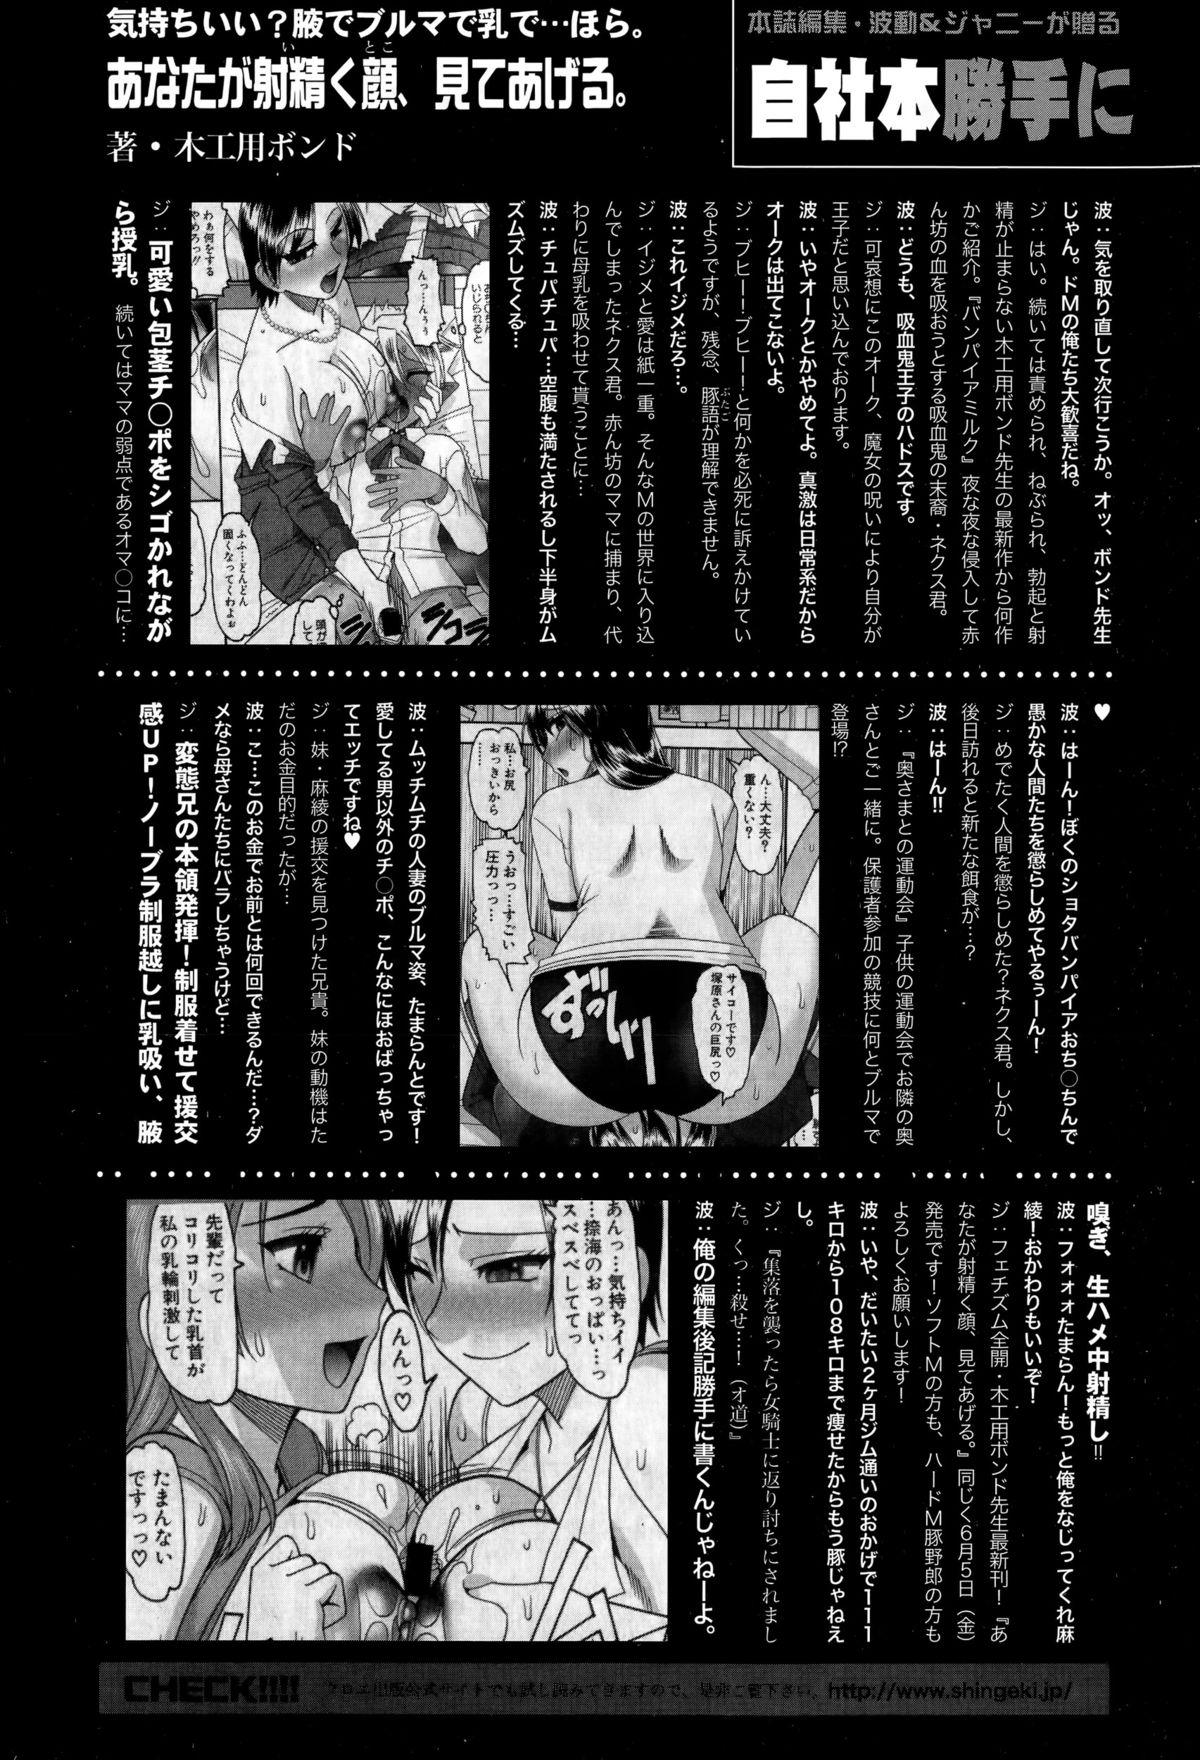 COMIC Shingeki 2015-07 349